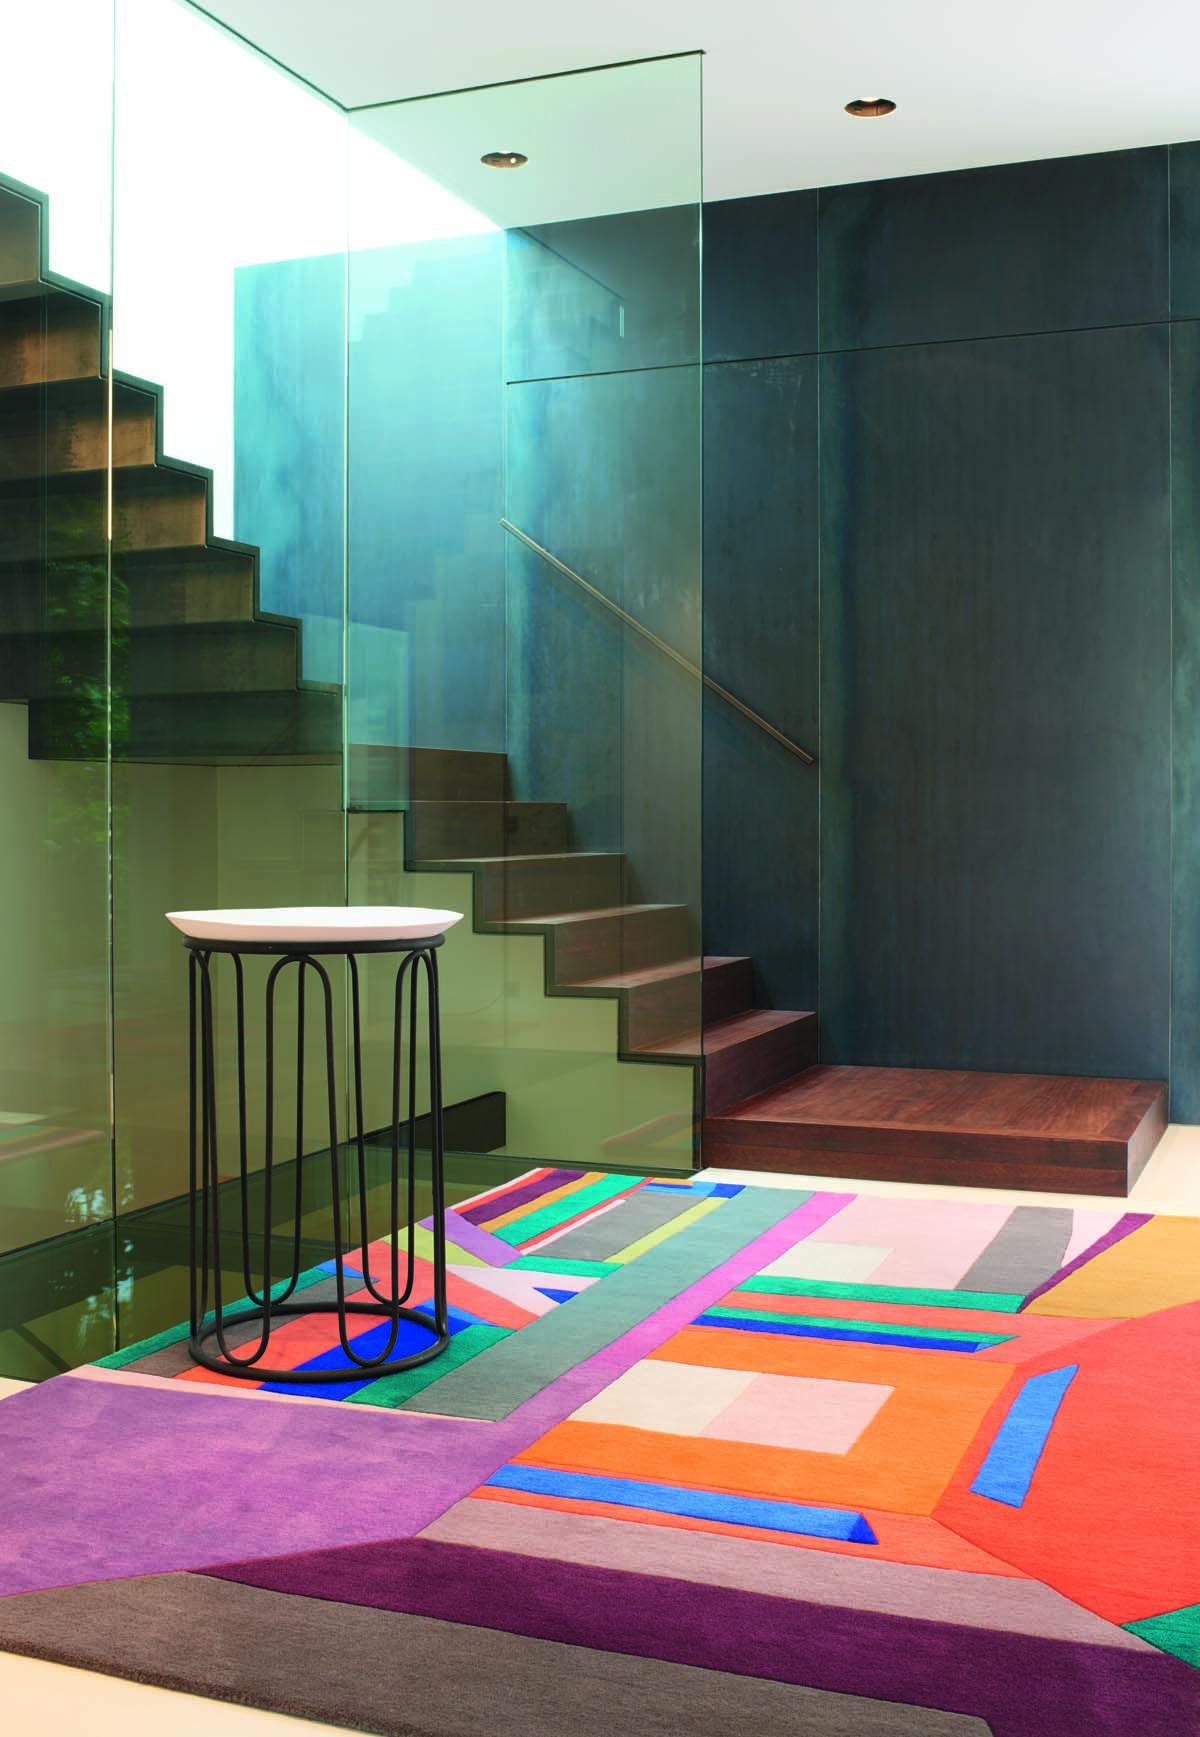 Mexico rug | Toulemonde Bochart | RUGS | Pinterest | House